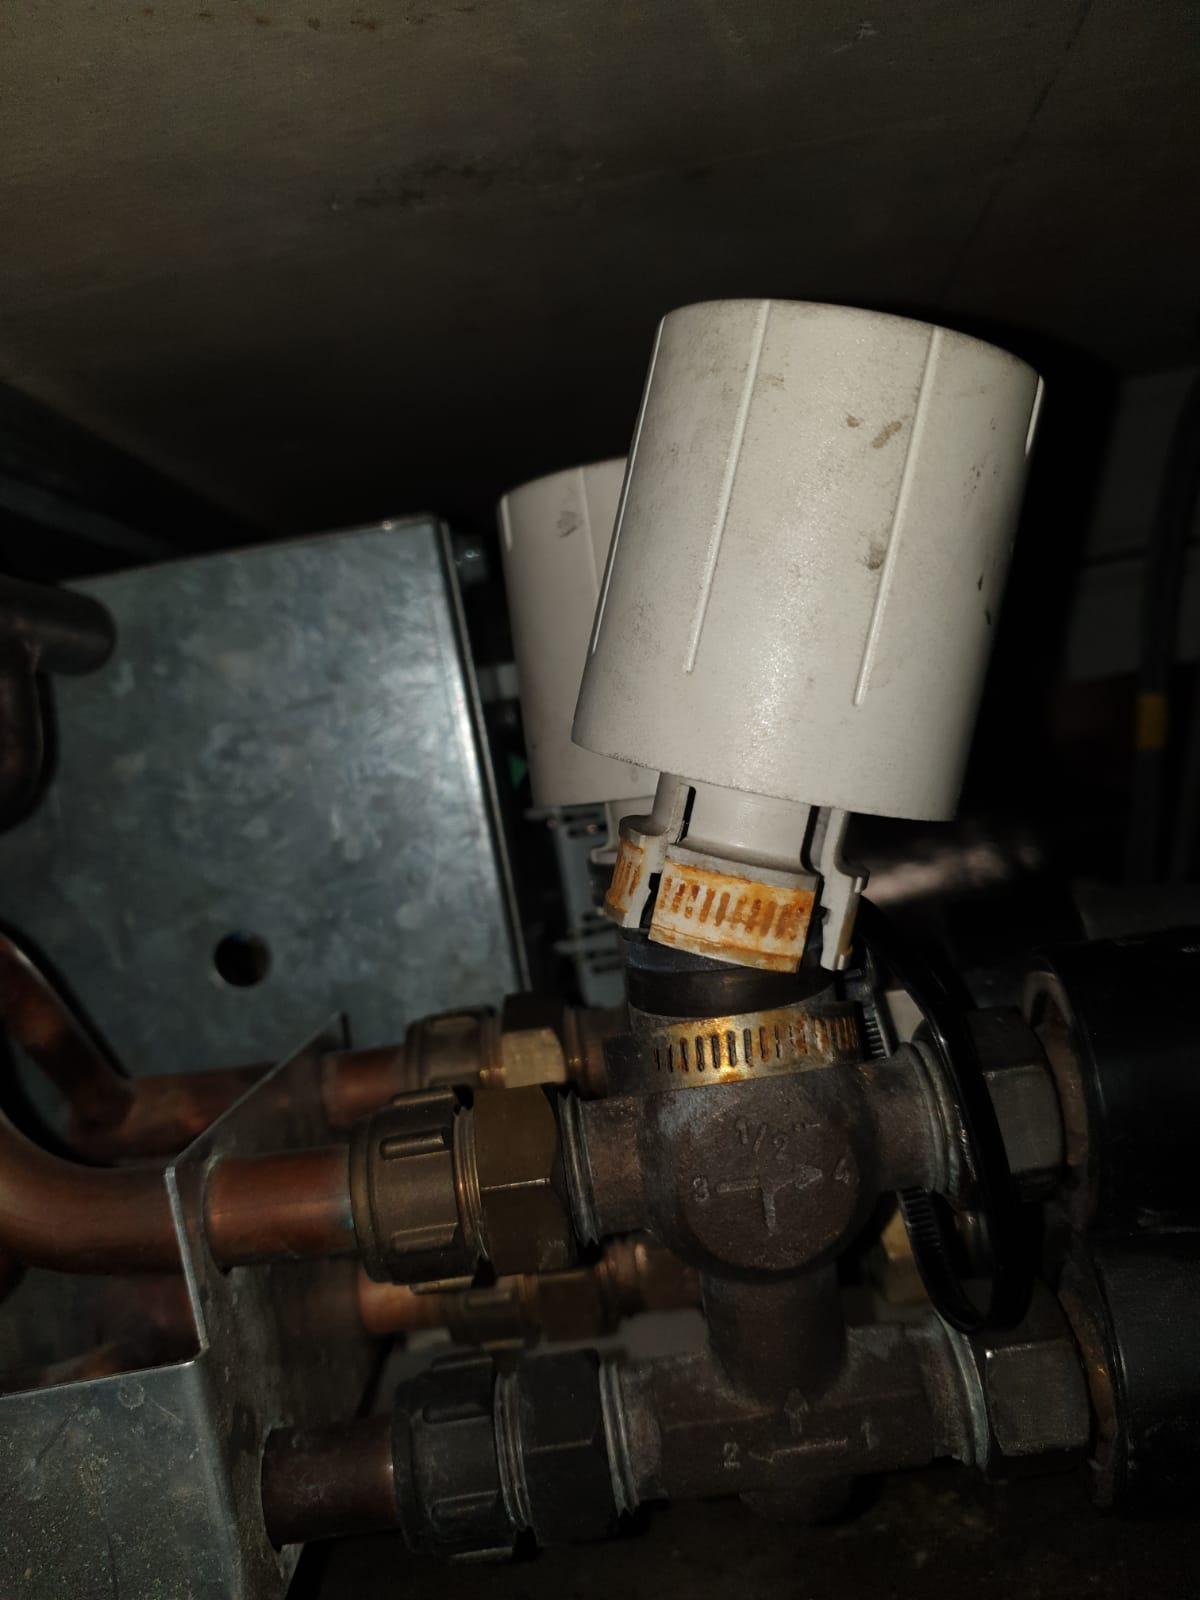 Broken actuator head of fan coil unit